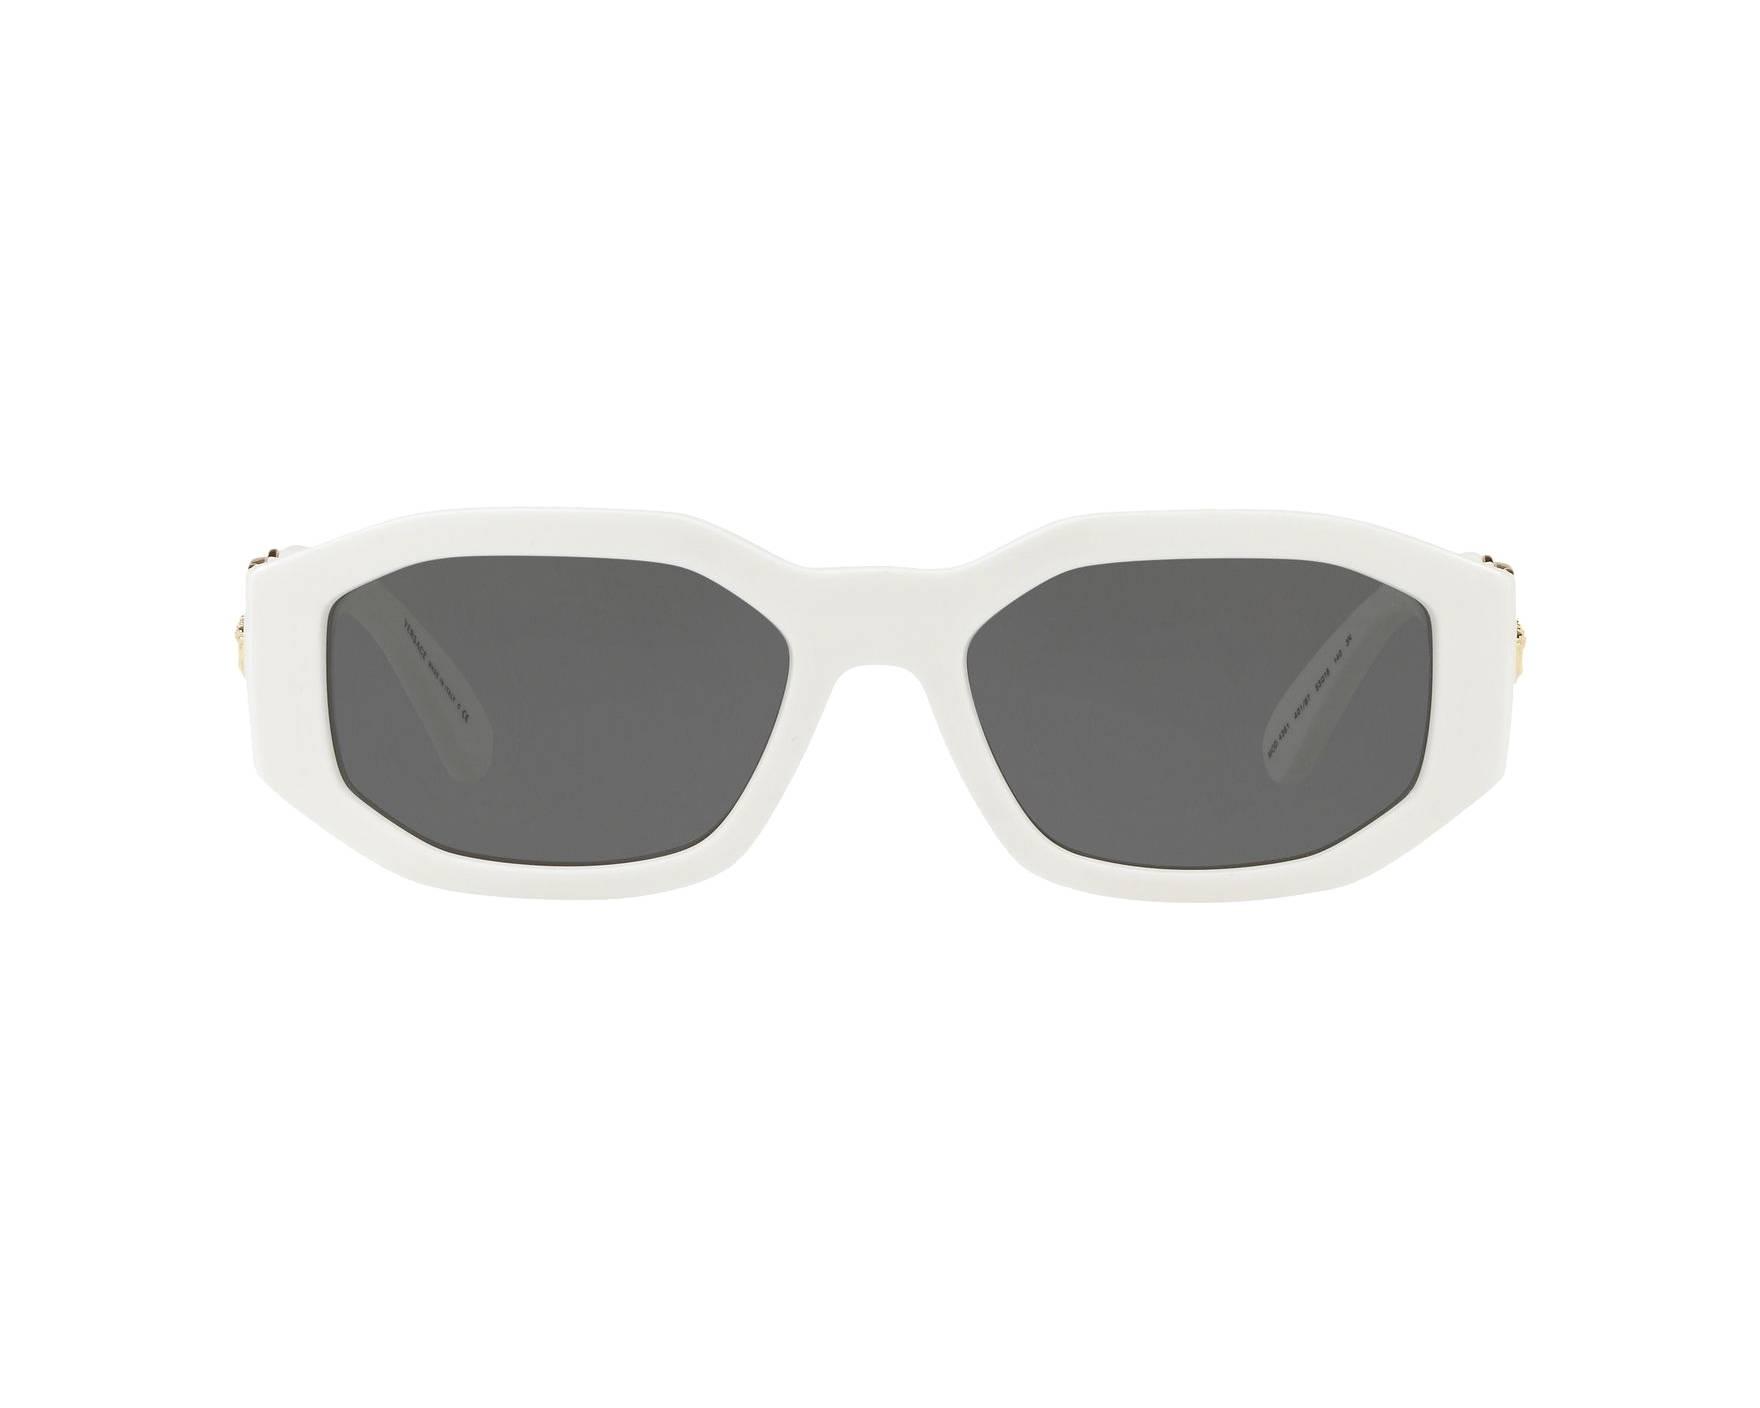 fadfb114ffad Sunglasses Versace VE-4361 401-87 53-18 White 360 degree view 1